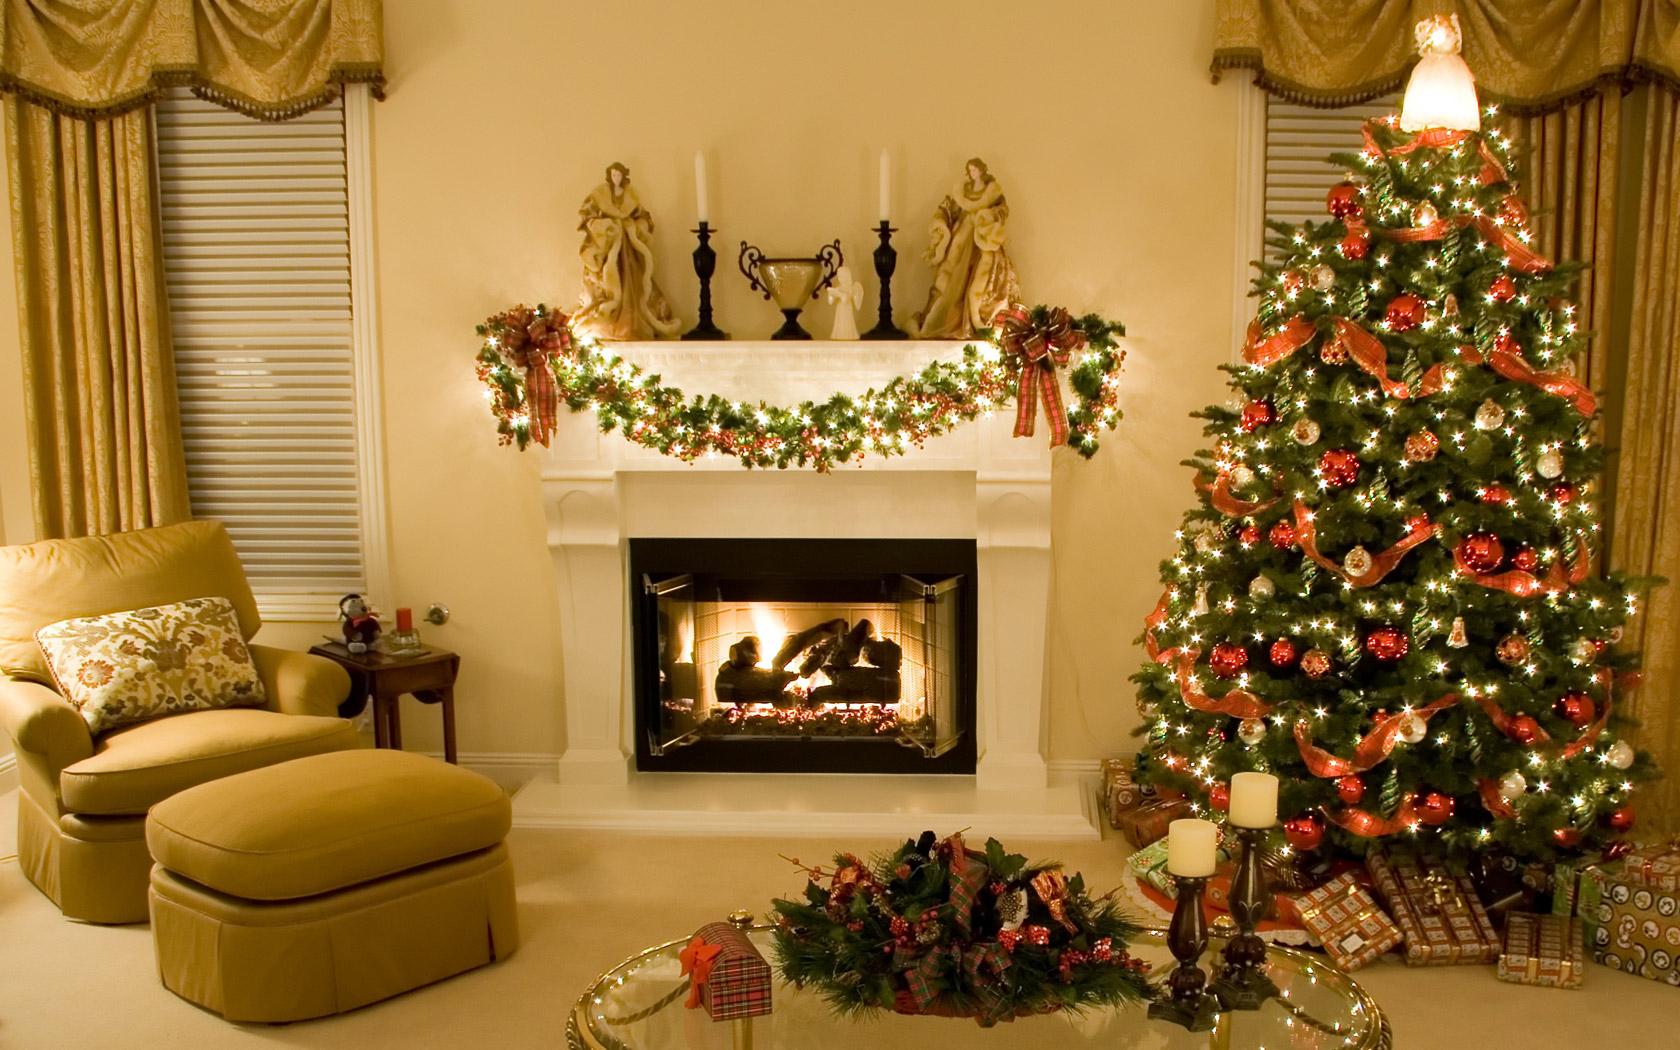 fireplace xmas fireplace fireplace christmas dact us christmas fireplace junsaus